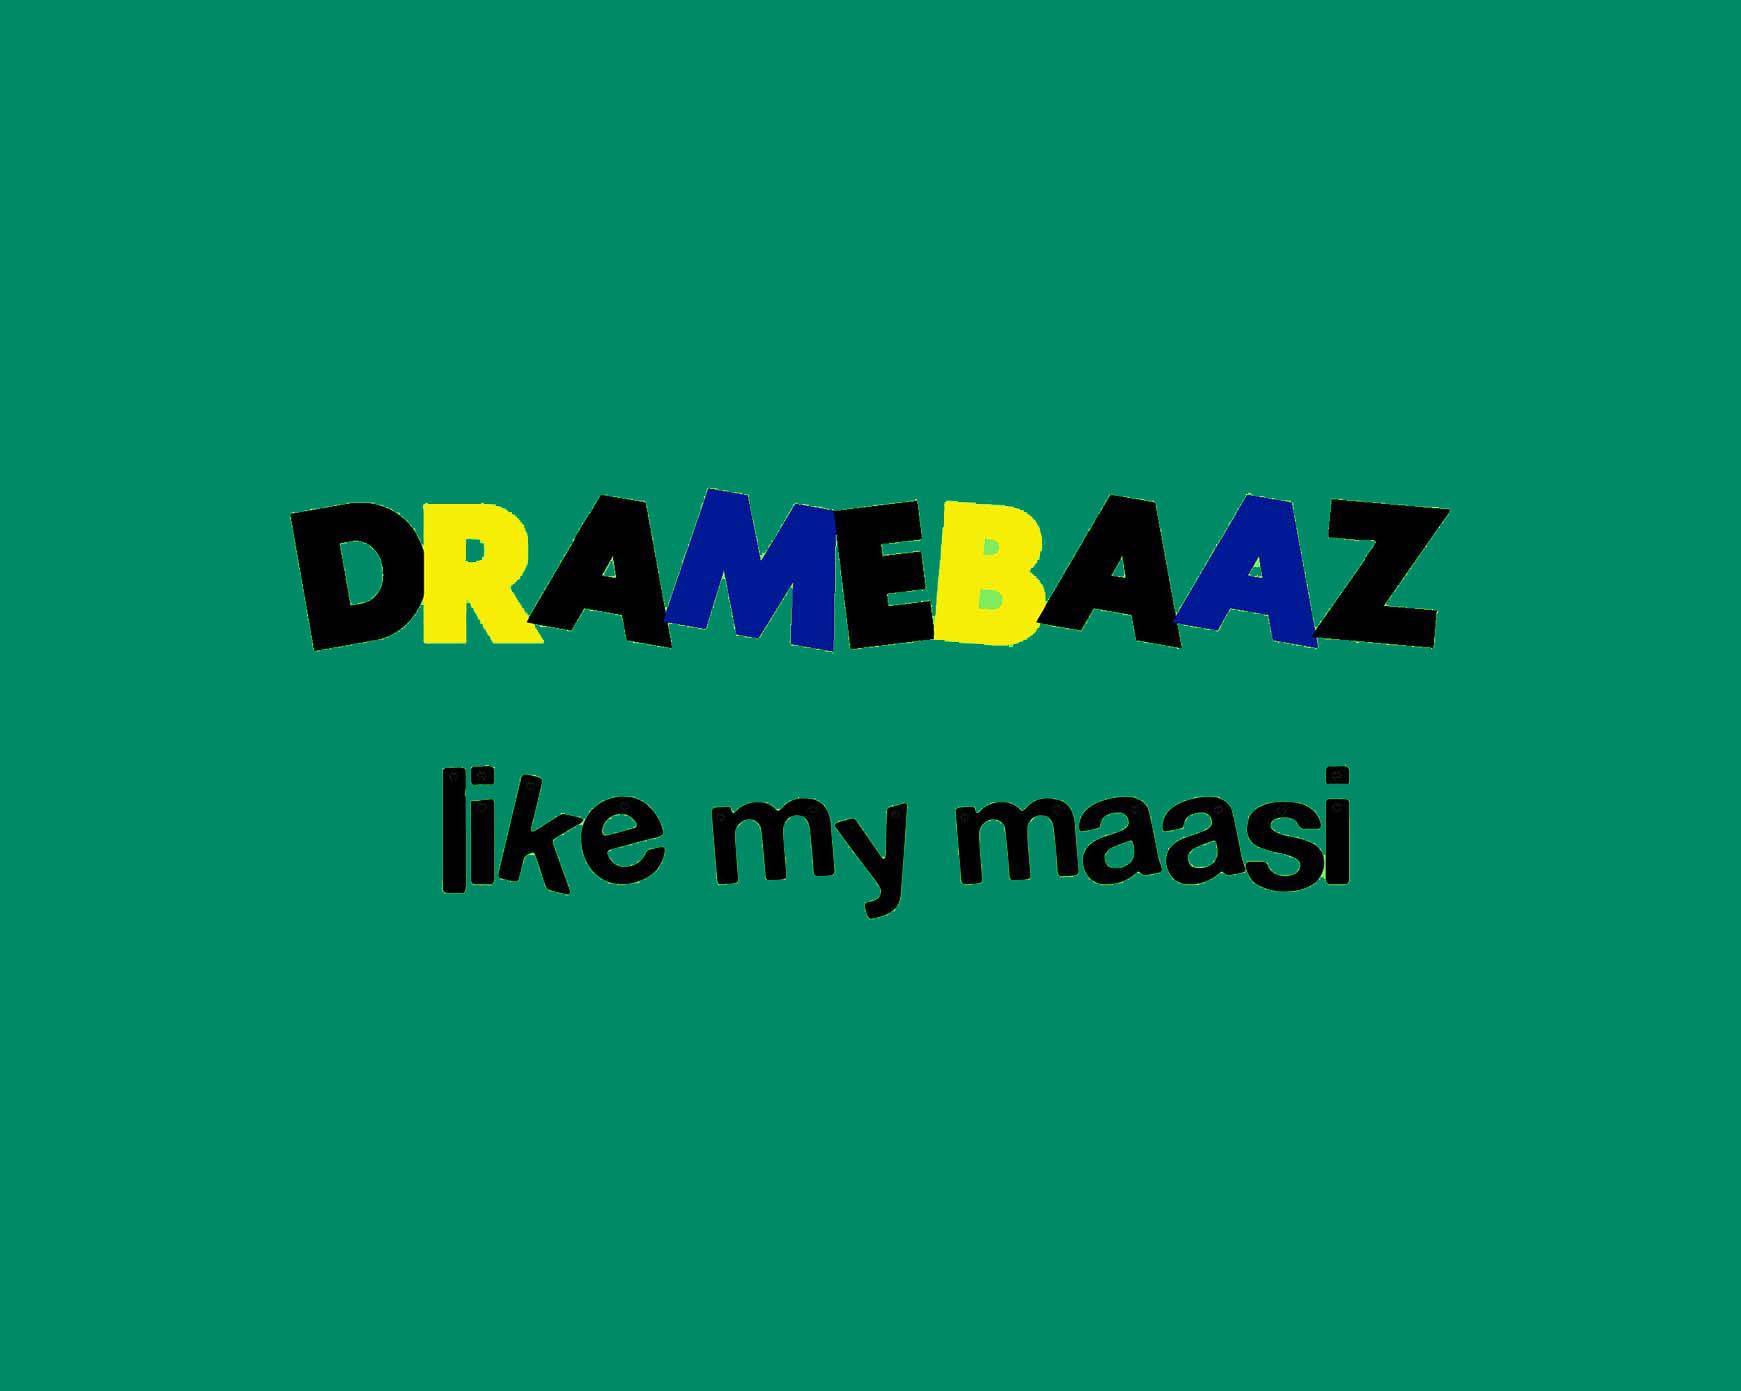 dramebaaz-c.jpg